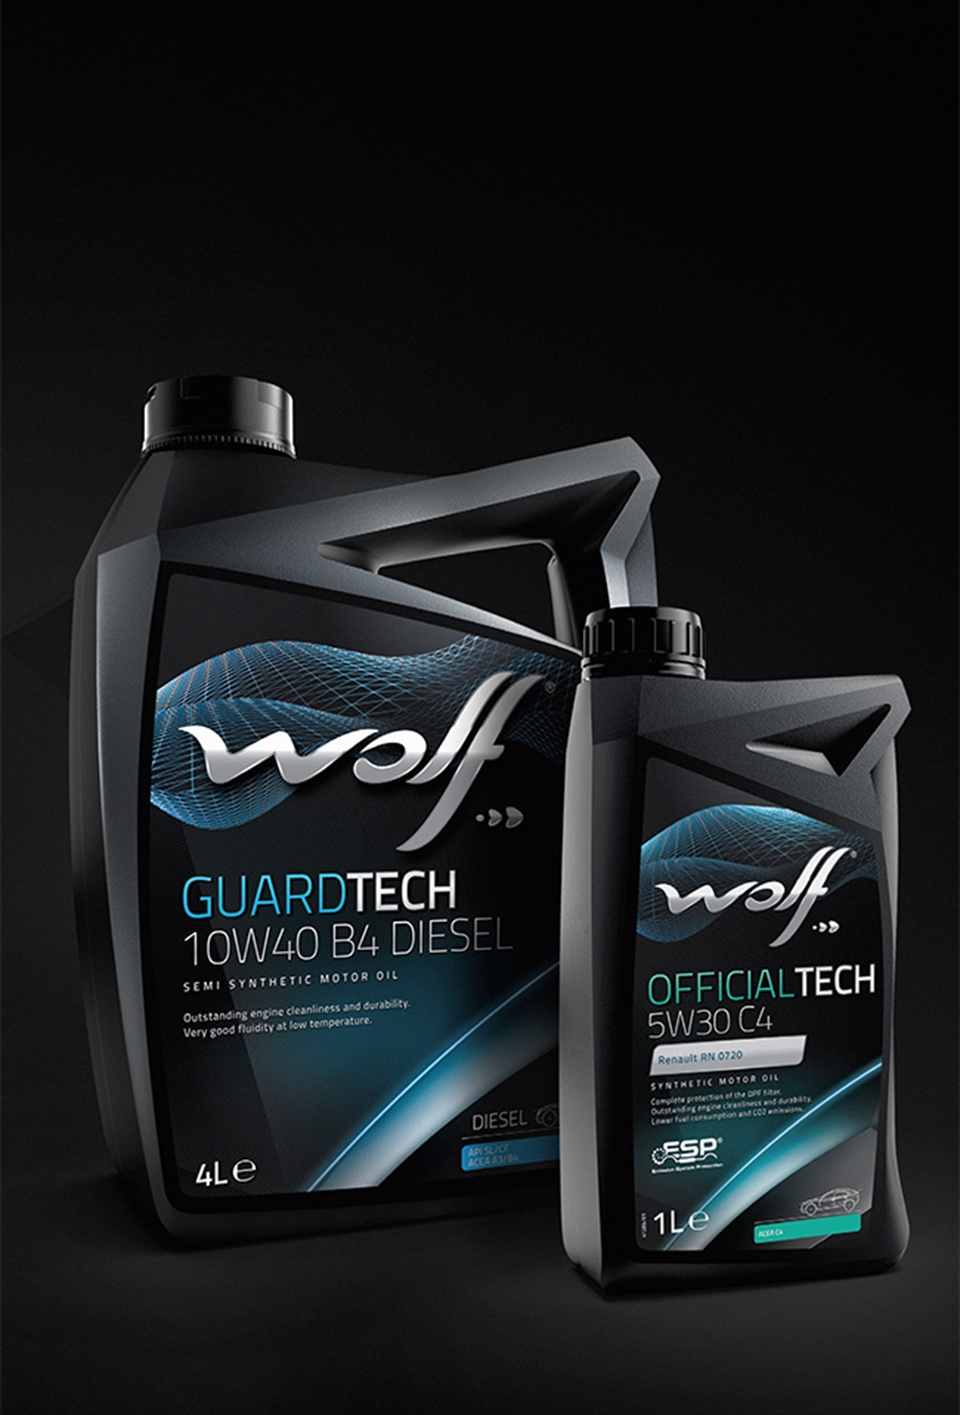 07-Guardtech-5L-and-Officaltech-1L